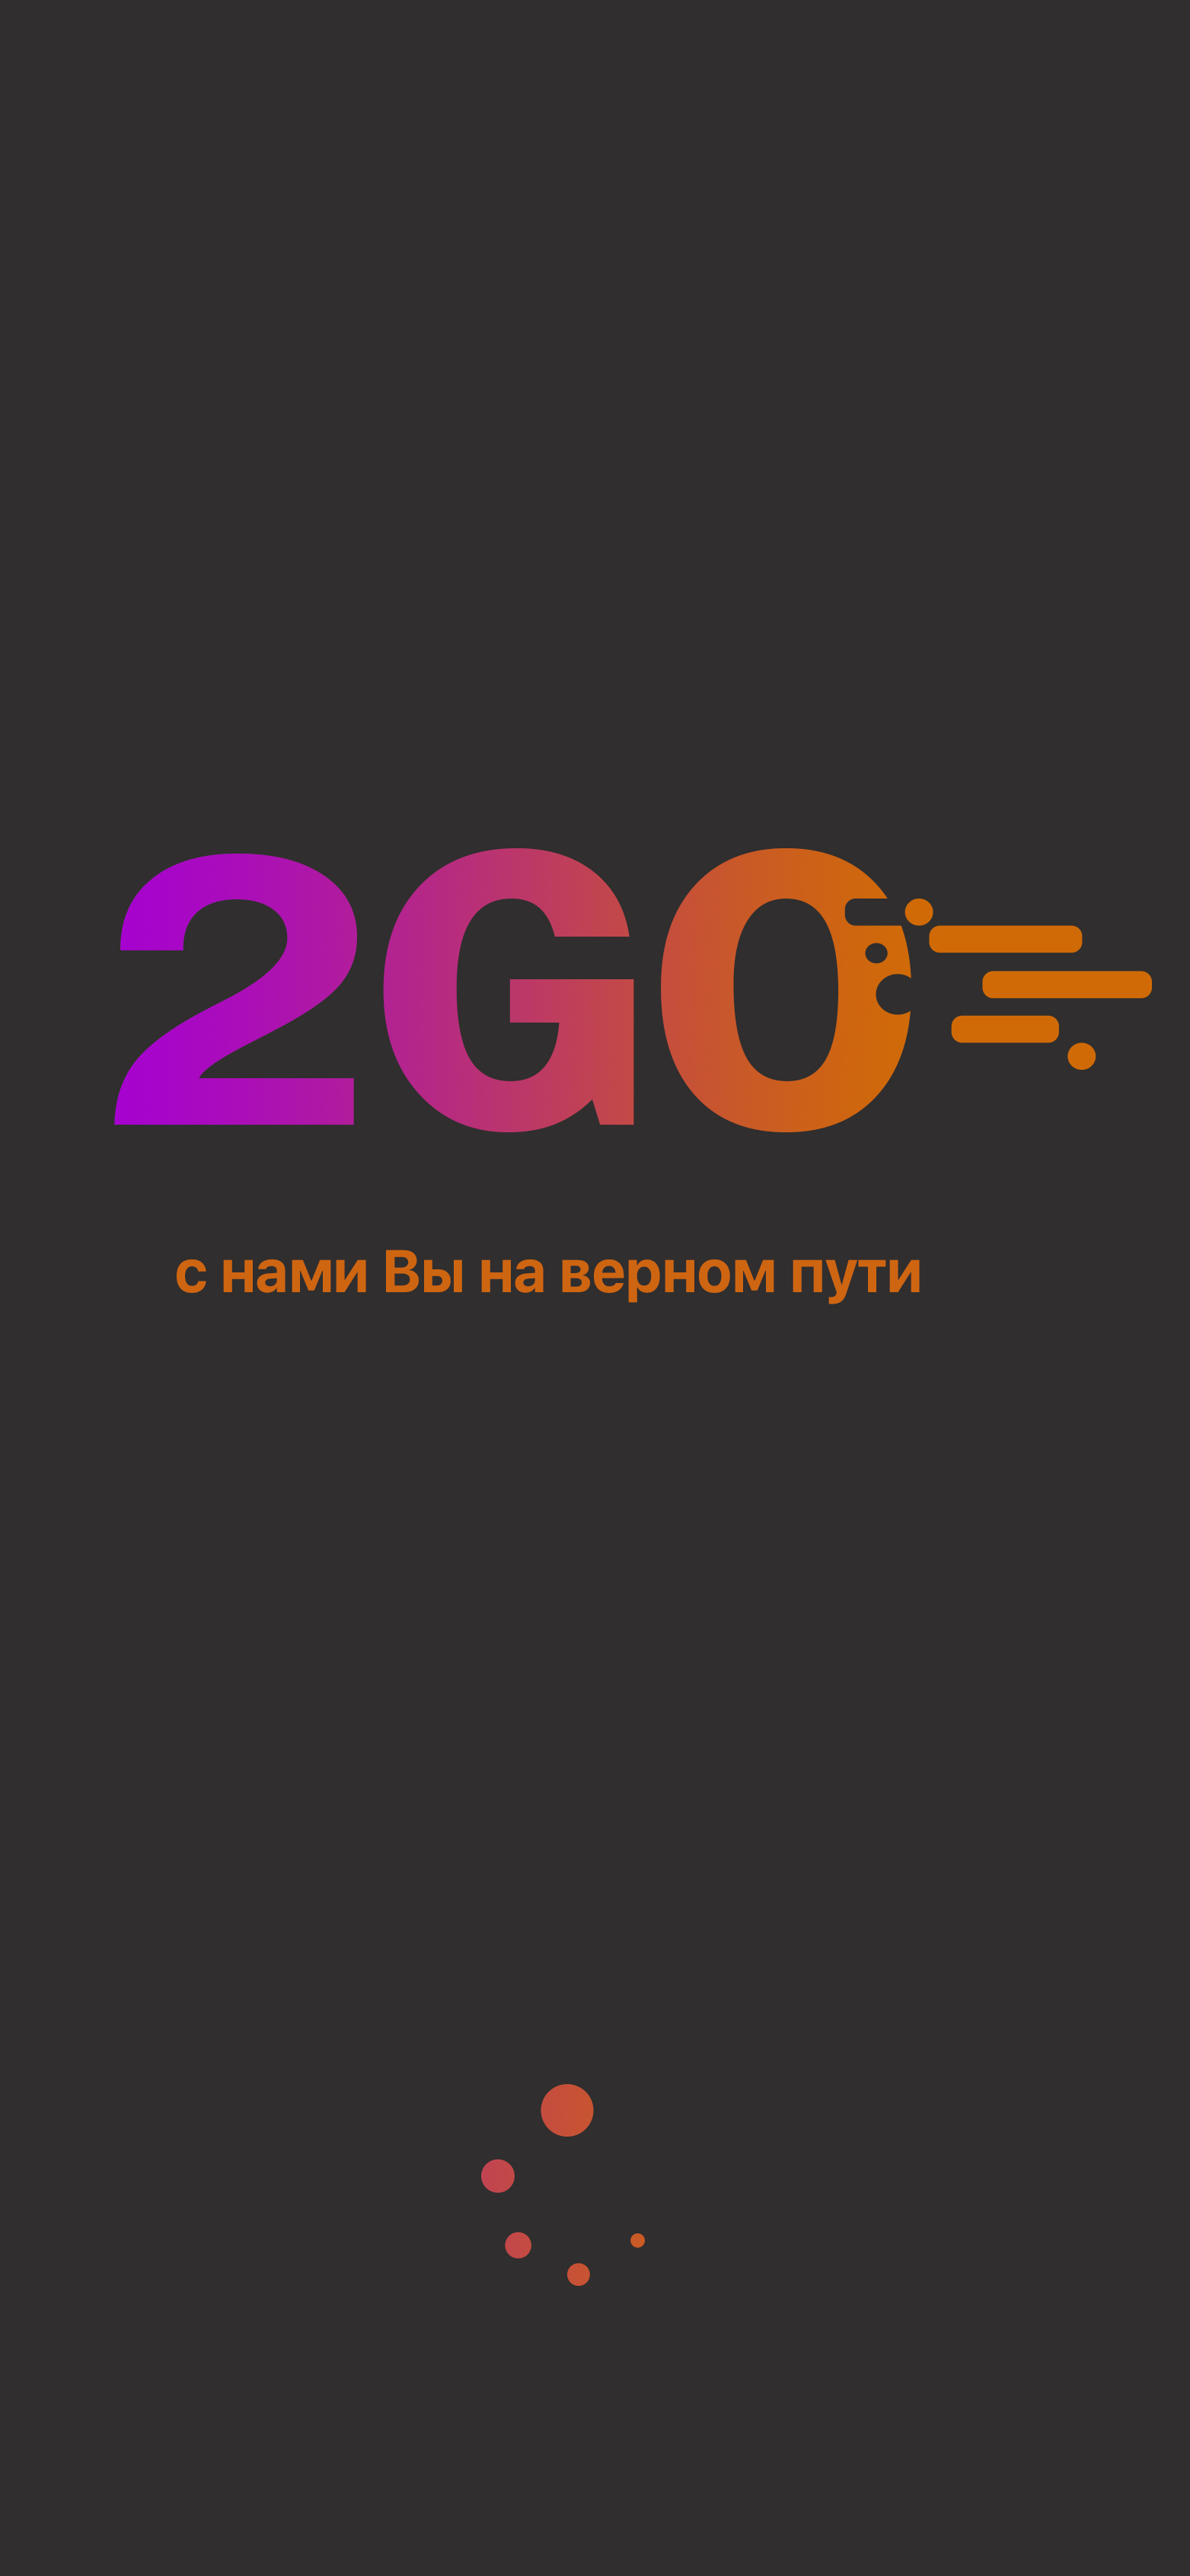 Разработать логотип и экран загрузки приложения фото f_7595a8892b6011f6.jpg